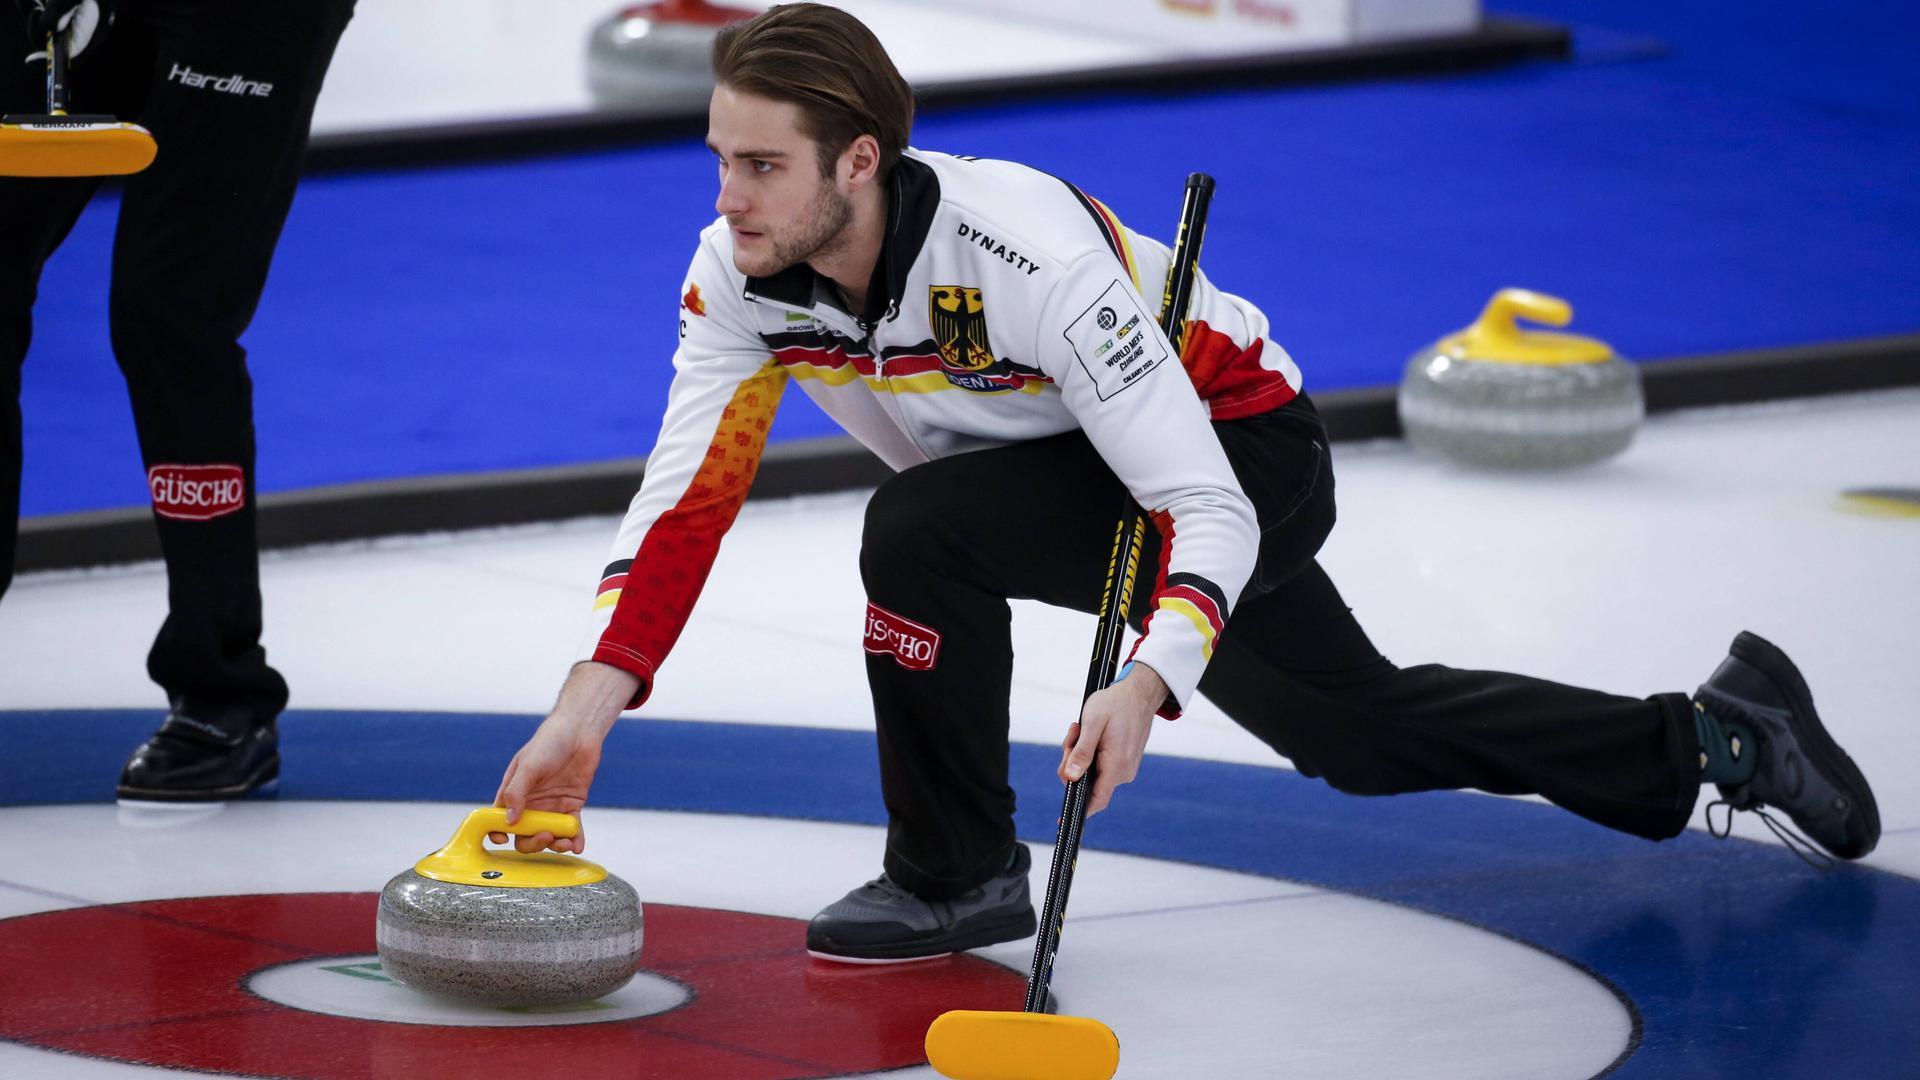 April 3, 2021, Calgary, ab, Canada: Germany skip Sixten Totzek makes a shot as he plays Switzerland at the Men s World Curling Championships in Calgary, Alta., Saturday, April 3, 2021. Sixten Totzek PUBLICATIONxINxGERxSUIxAUTxONLY - ZUMAc35_ 20210403_zaf_c35_009 Copyright: xJeffxMcintoshx